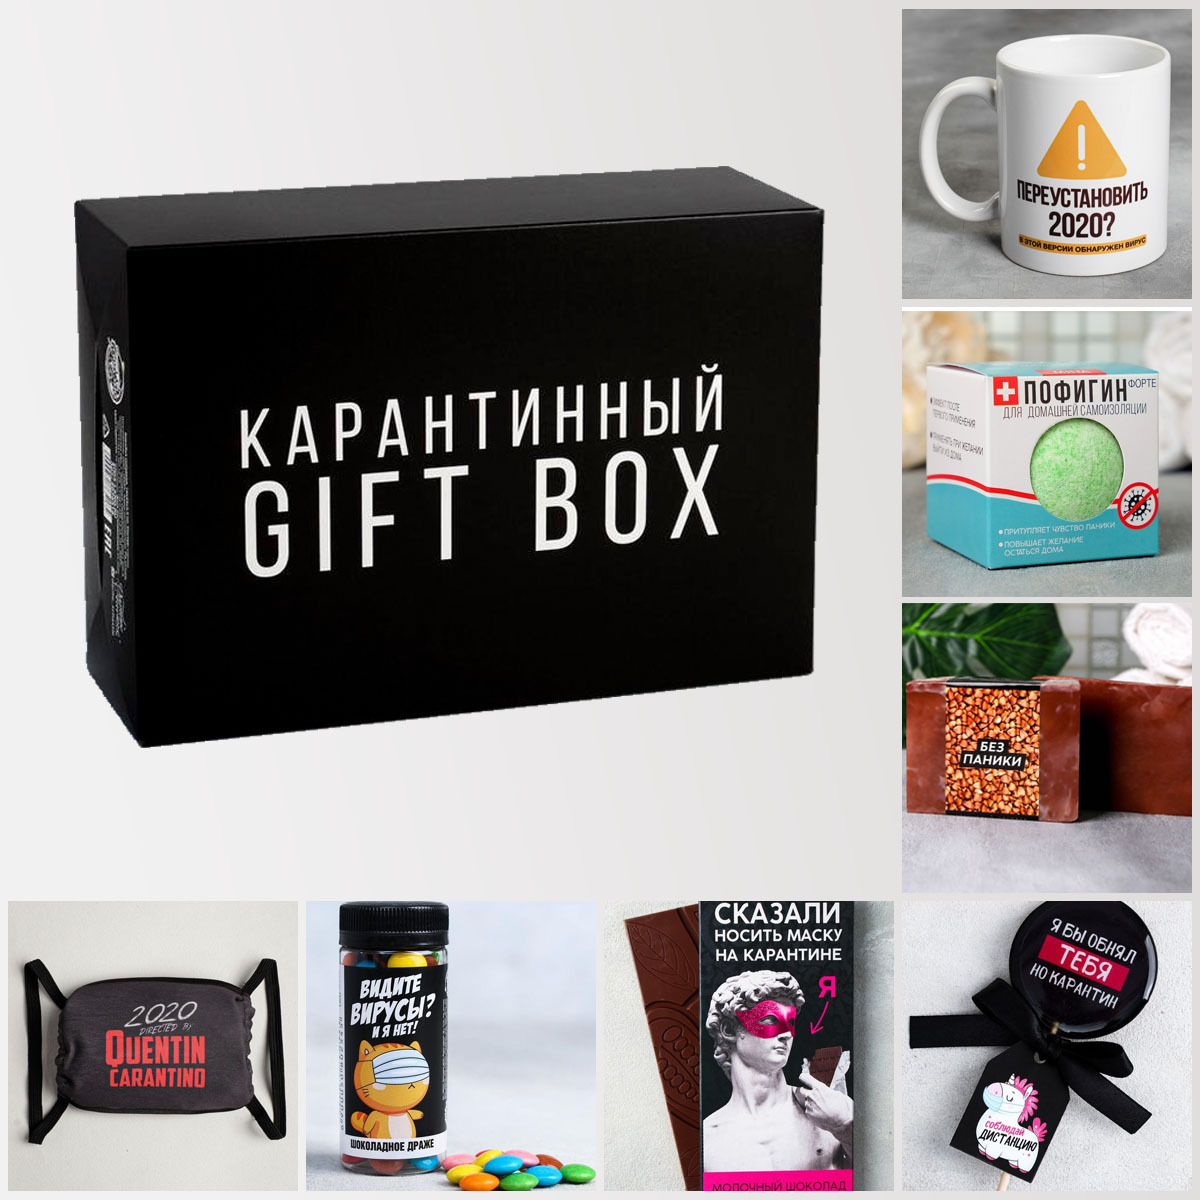 Карантинный Gift Box